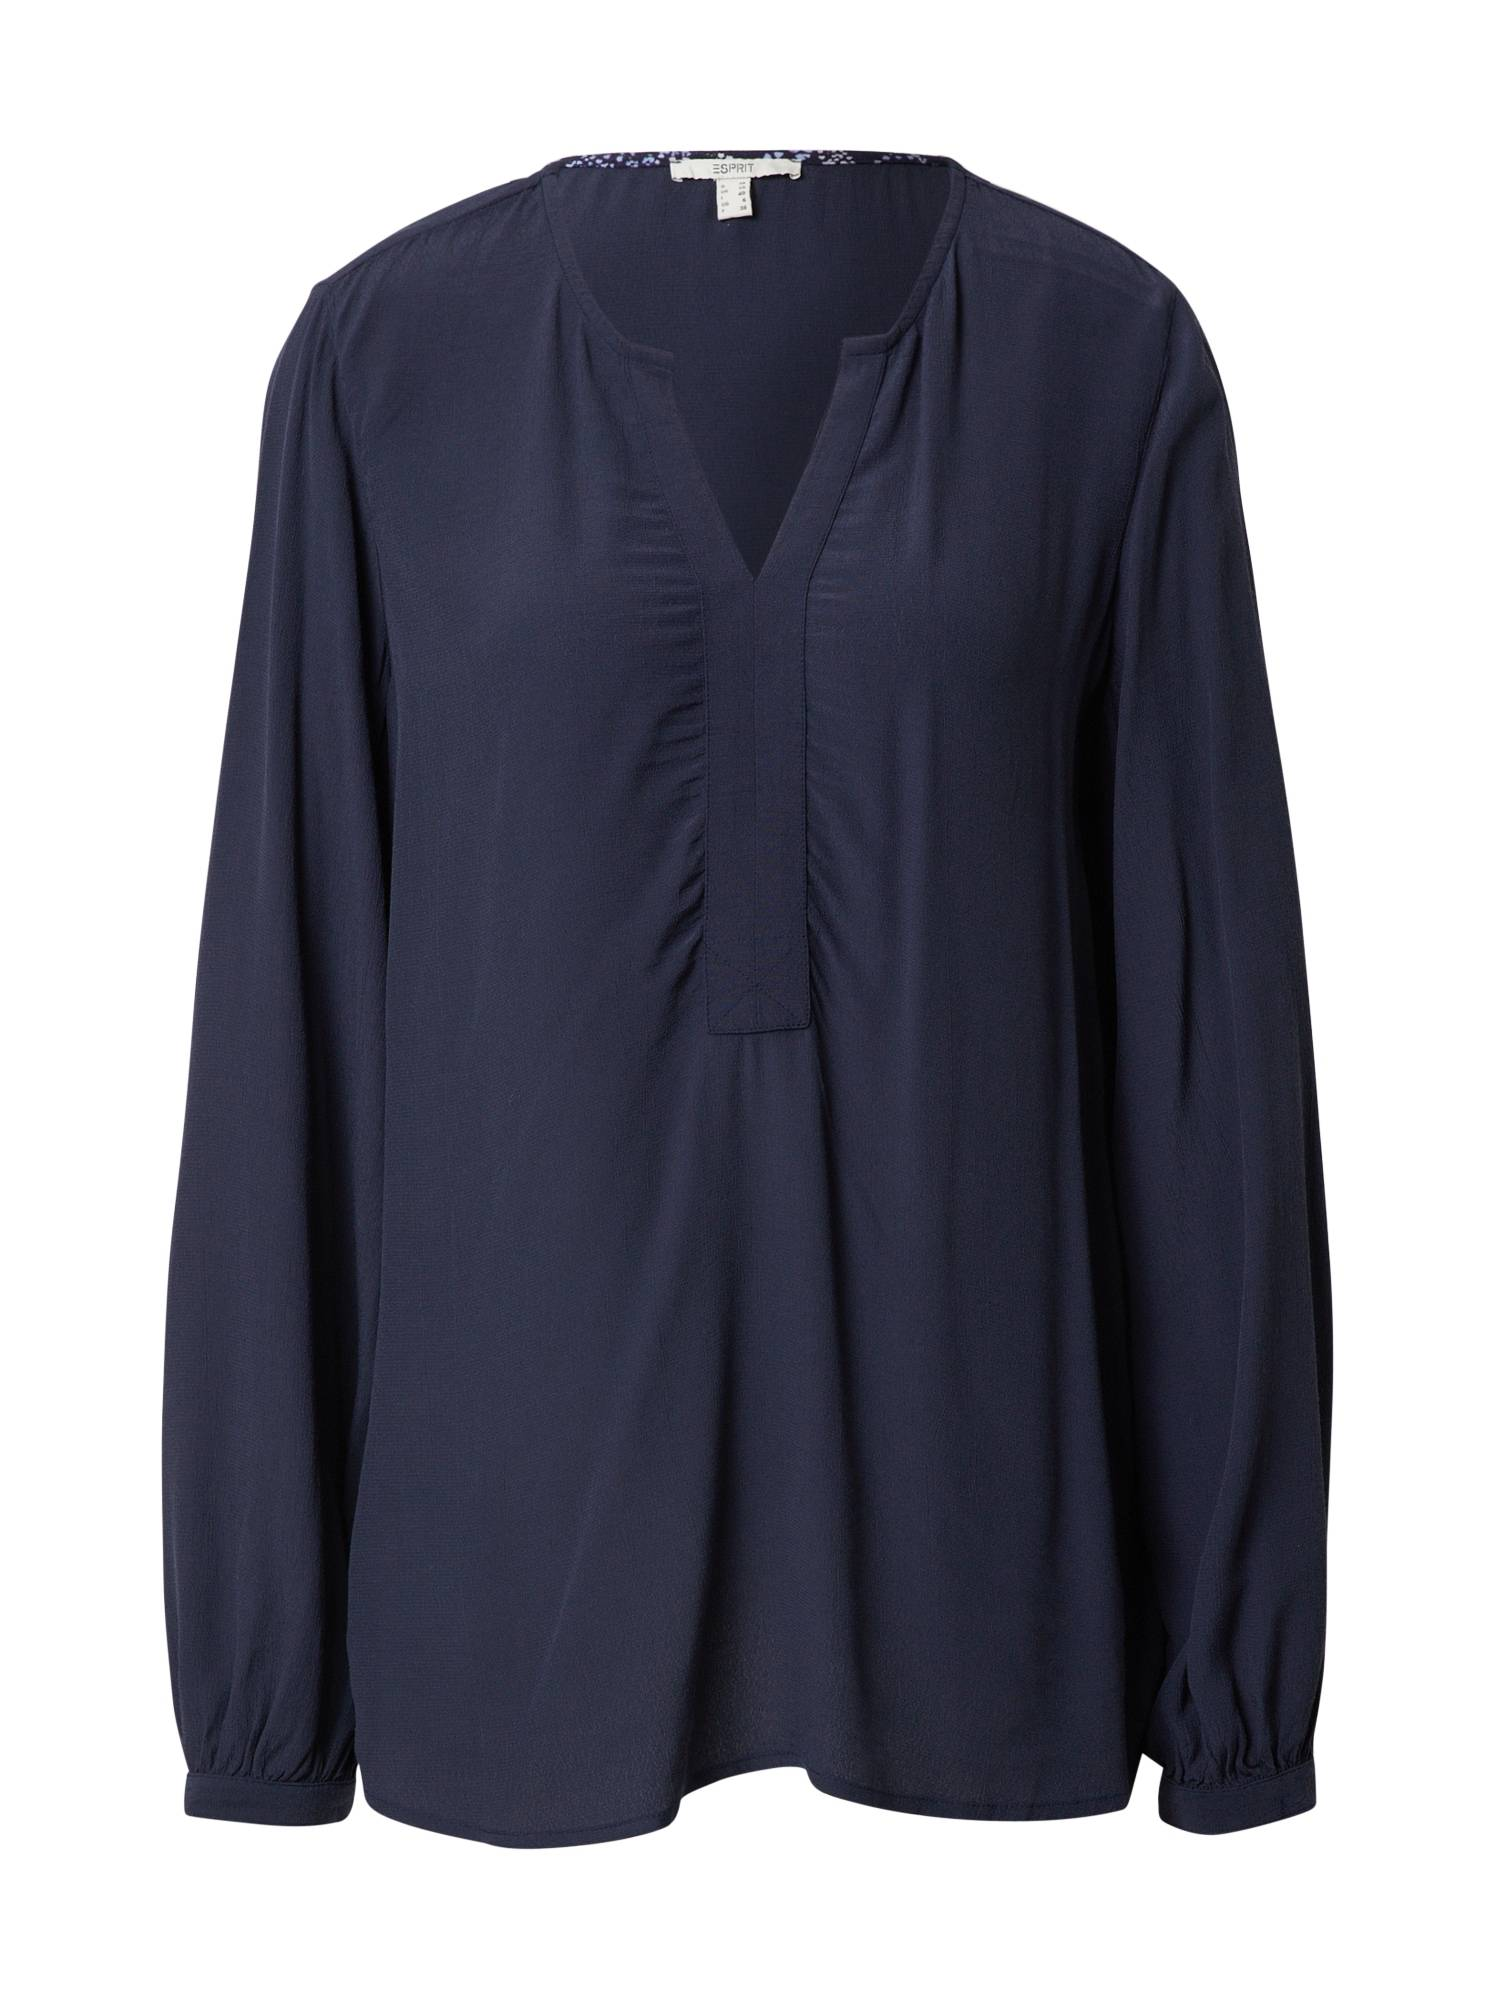 Esprit Chemisier 'Marocain'  - Bleu - Taille: 40 - female